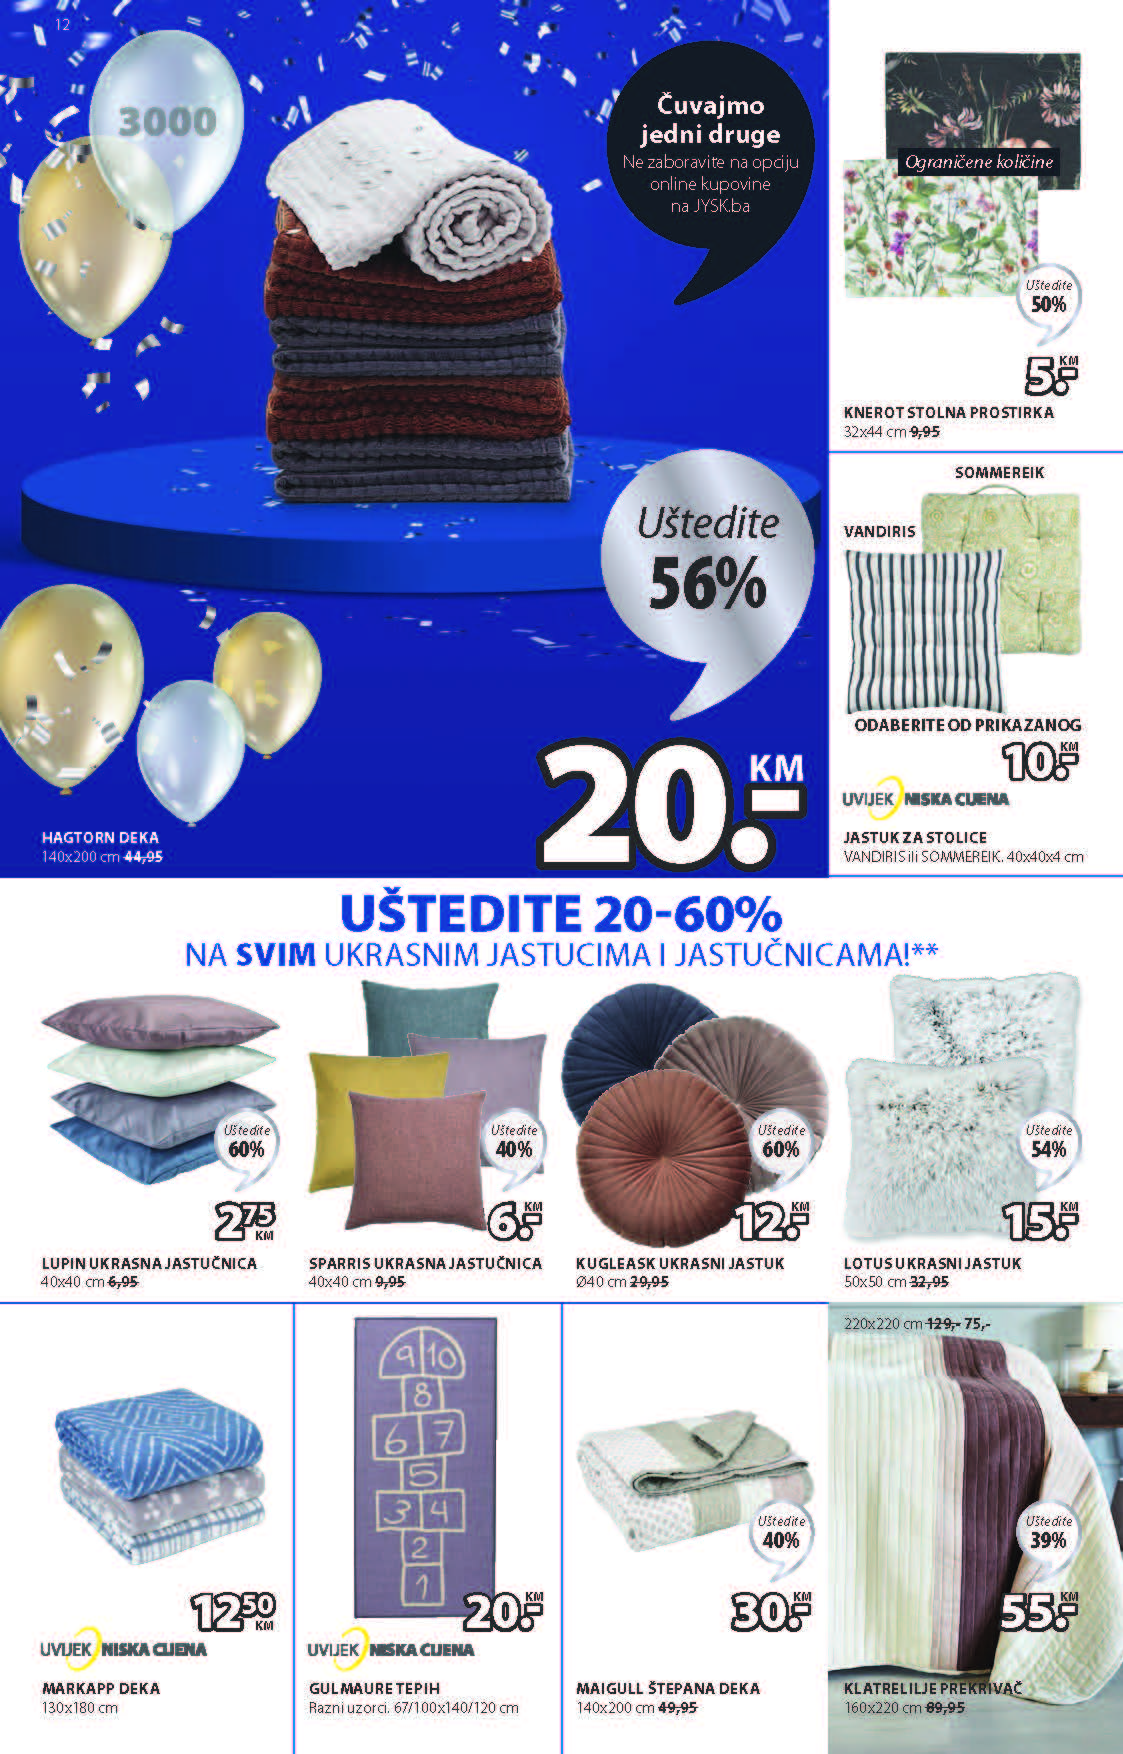 JYSK Katalog Akcijska ponuda MAJ 13.05.2021. 26.05.2021 ekatalozi.com Page 13 1